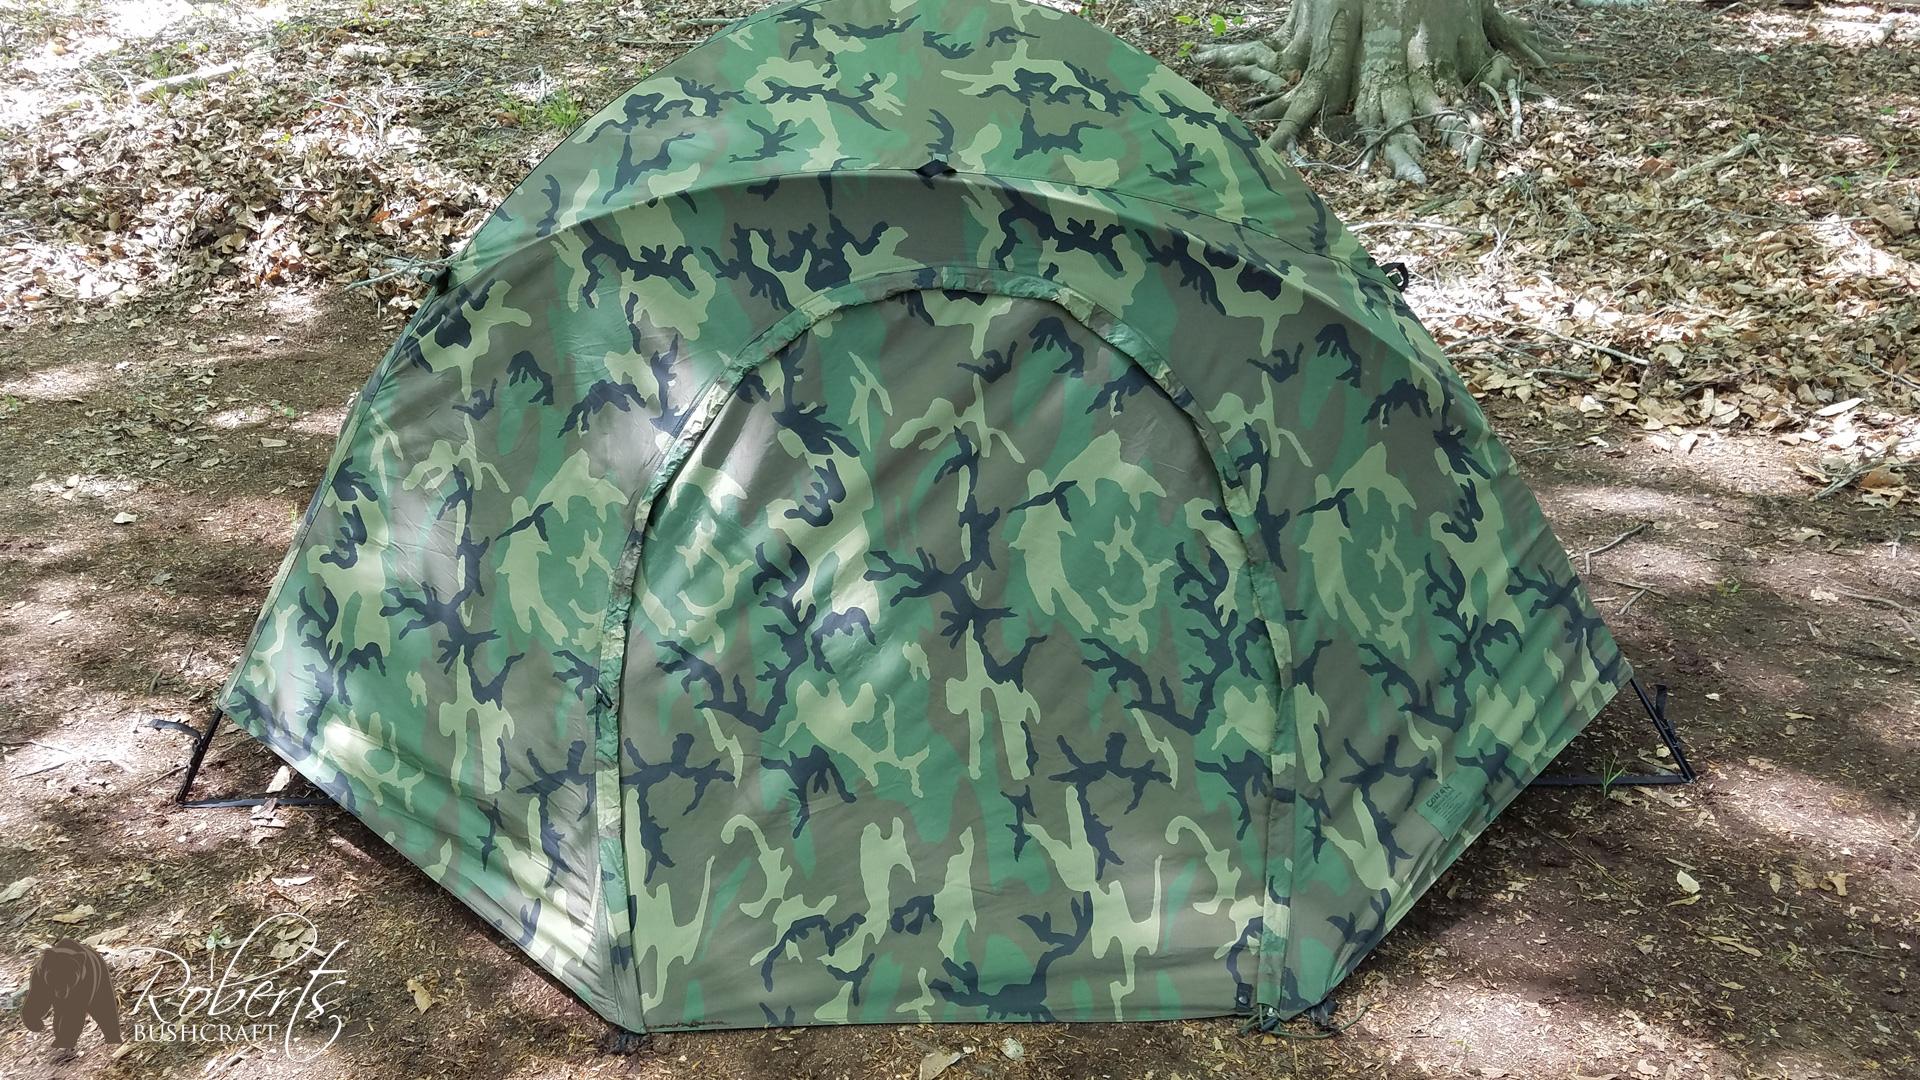 USMC Two Man Combat Tent fly USMC Two Man Combat Tent fly ... & USMC Two Man Combat Tent and Hooch Setup - Roberts Bushcraft Outdoor ...